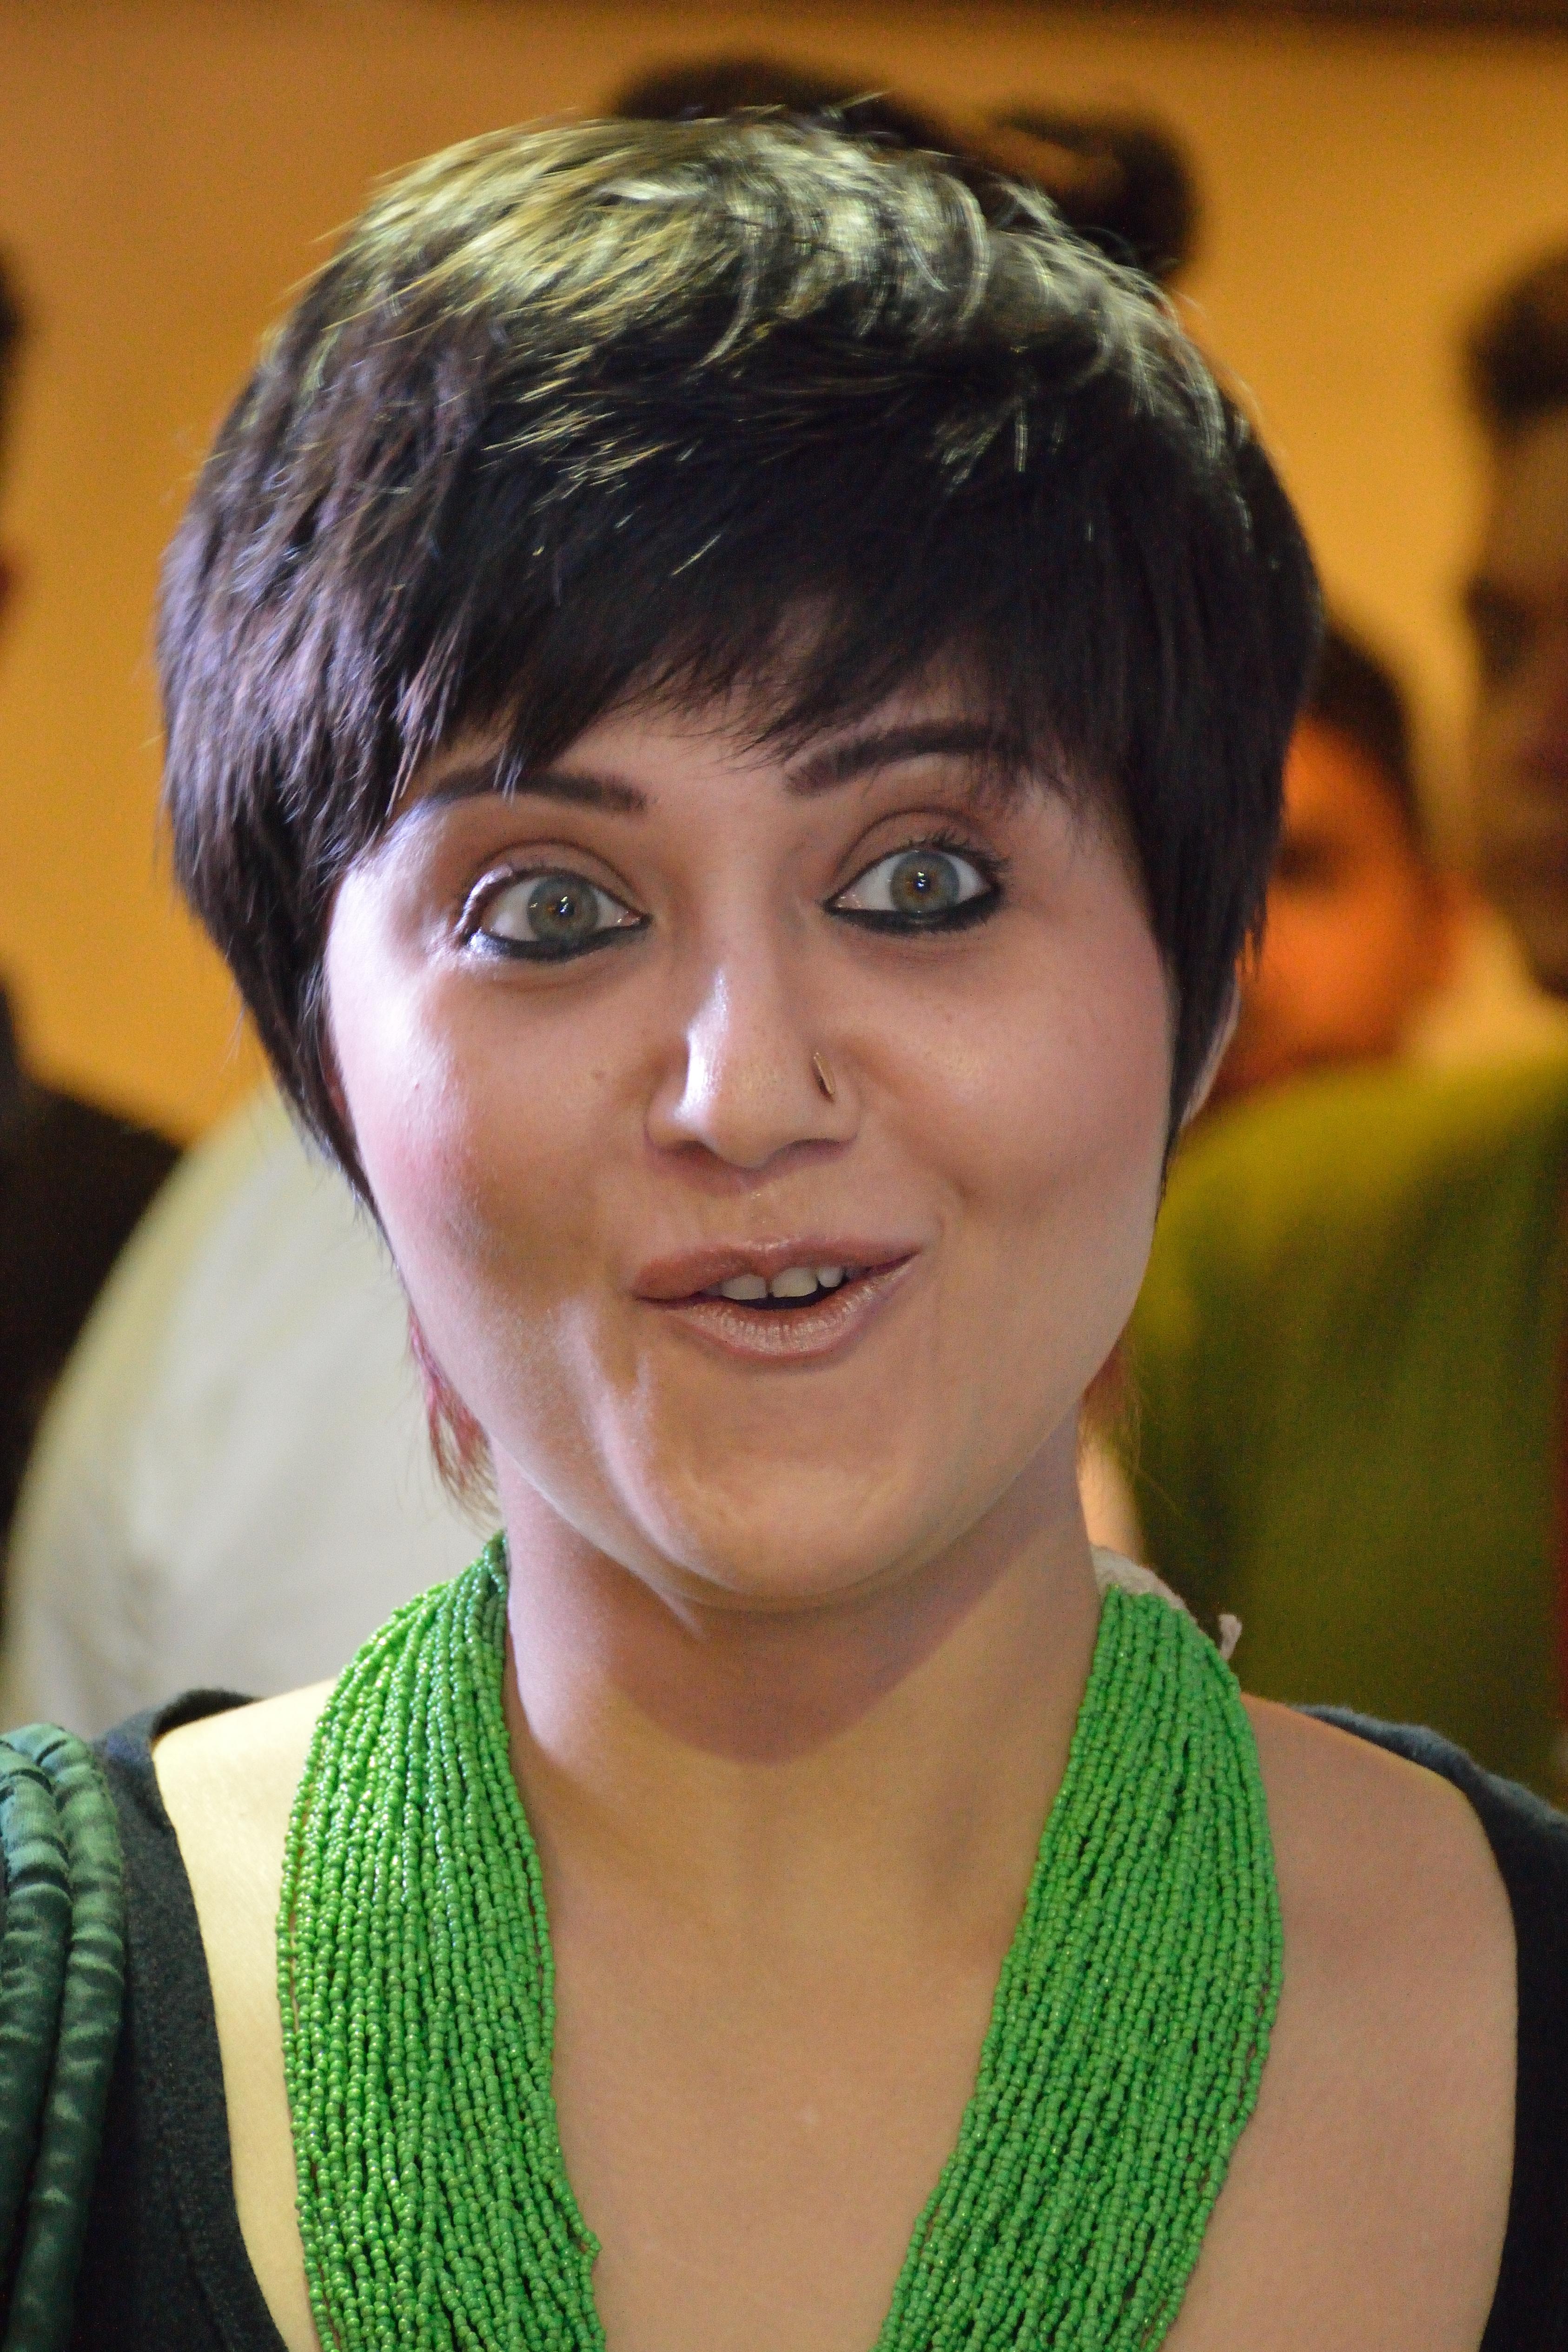 Paparazzi Swastika Mukherjee  nudes (77 pics), Facebook, butt